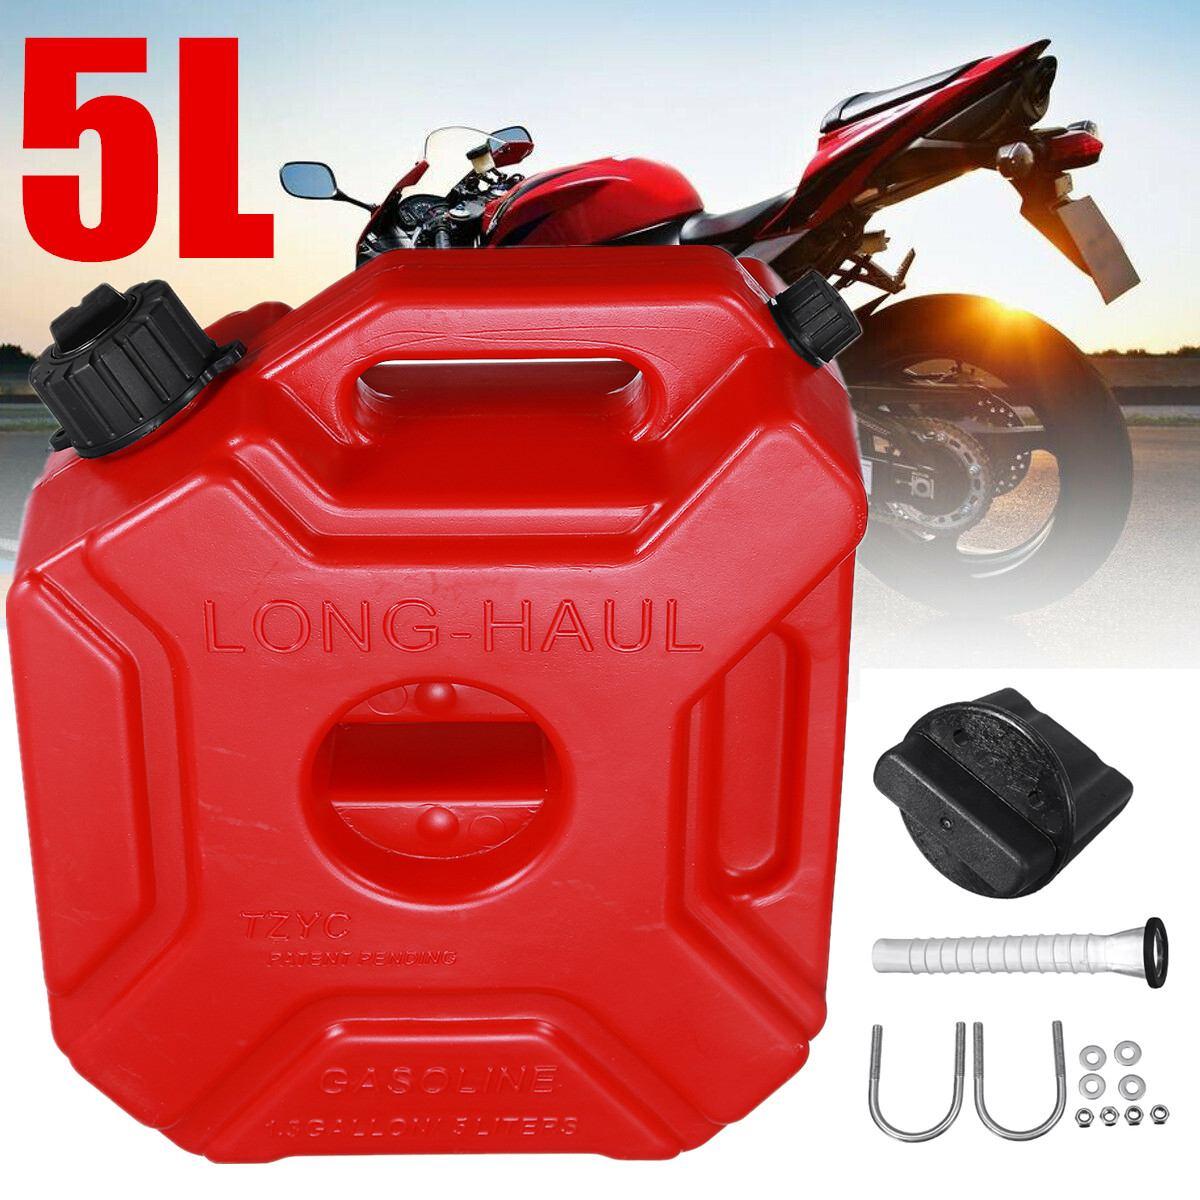 Partol 5L דלק טנקים פלסטיק בנזין פחיות מכונית ג 'רי יכול הר אופנוע ג' ריקן גז יכול בנזין שמן מיכל דלק מיכל